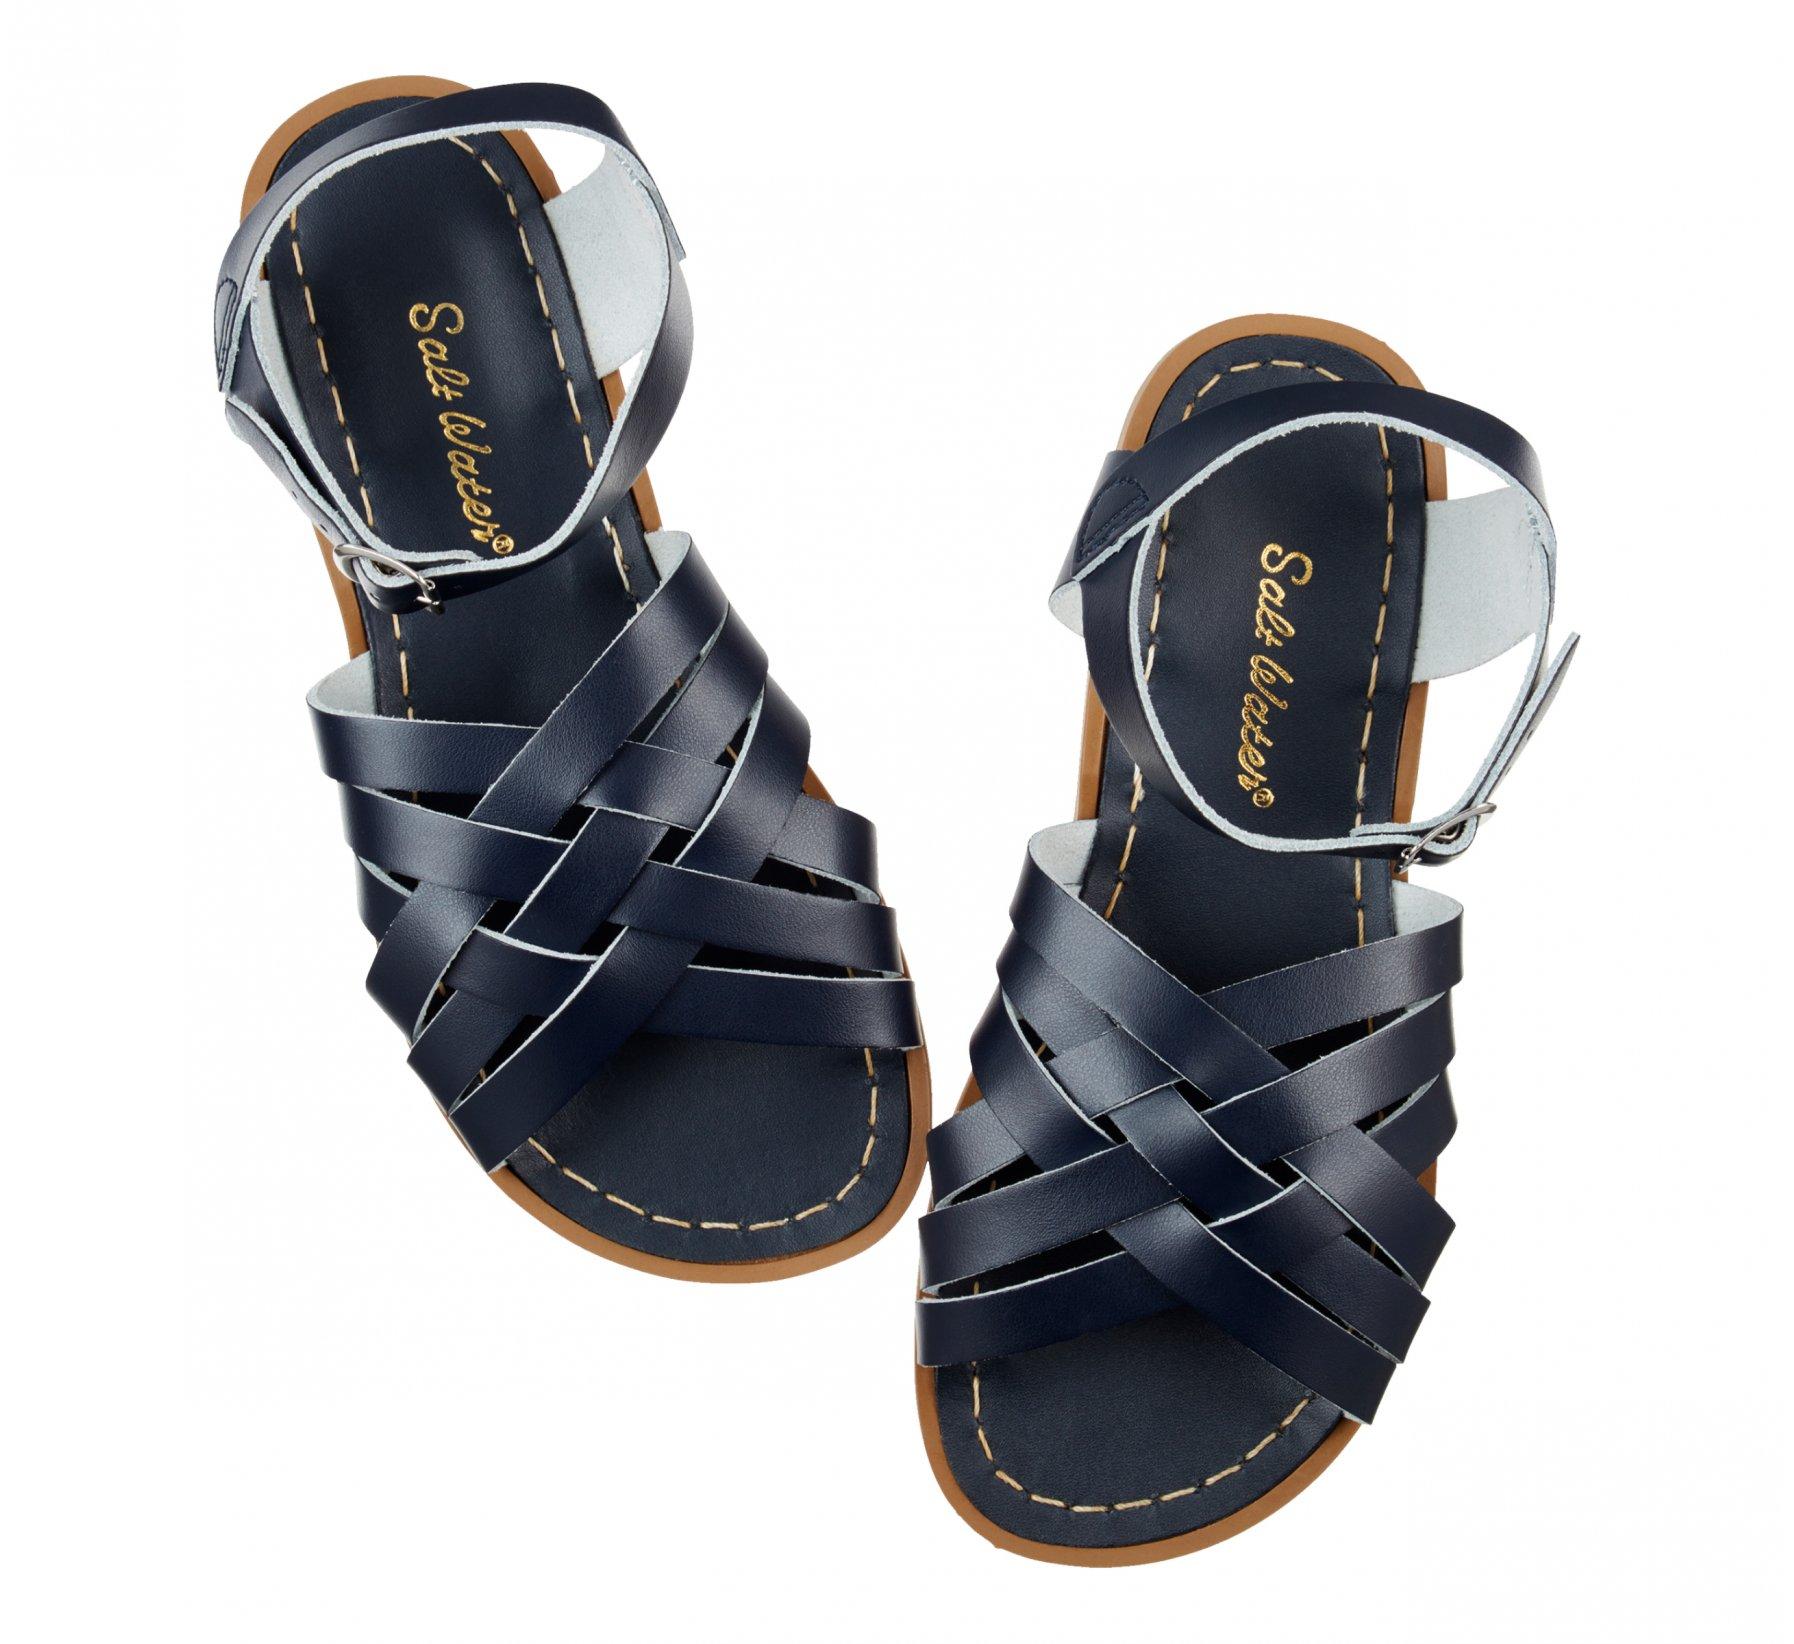 Retro Navy  - Salt Water Sandals